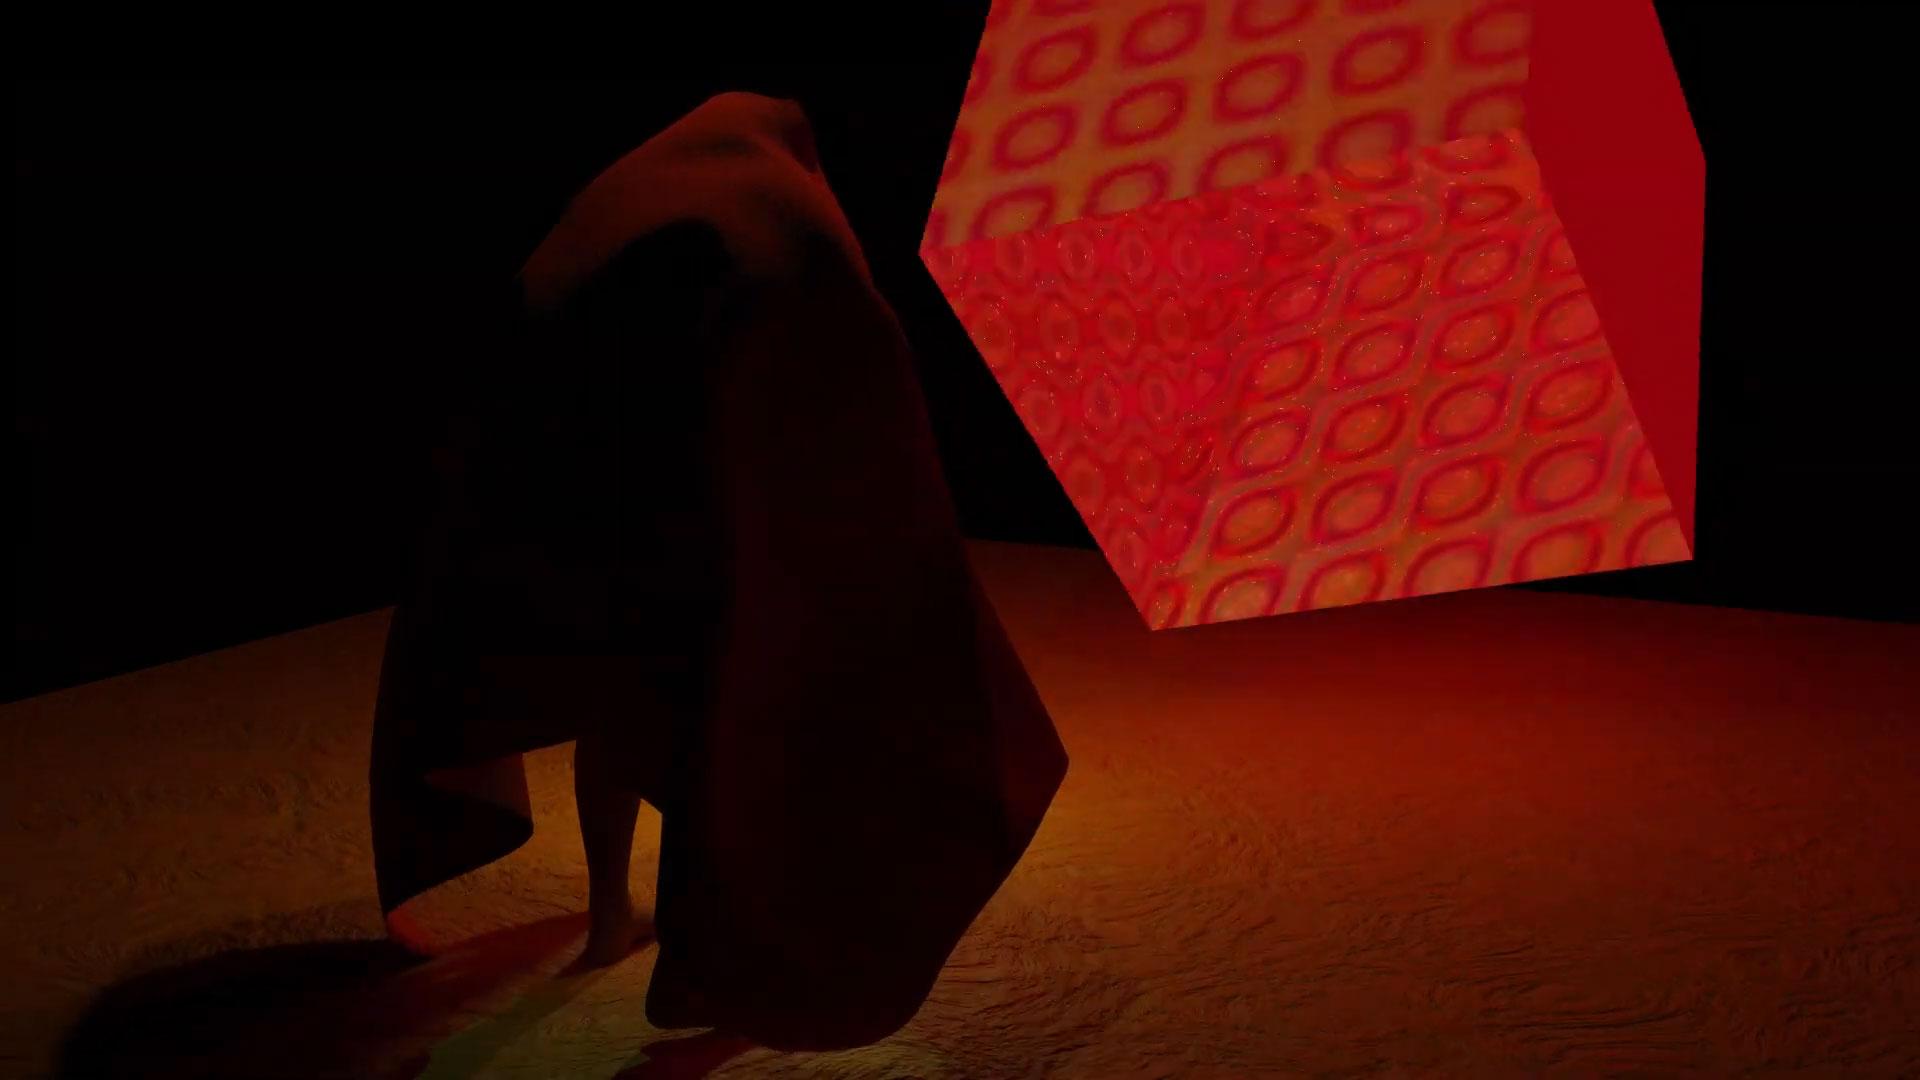 Avola - Self Help Music Video